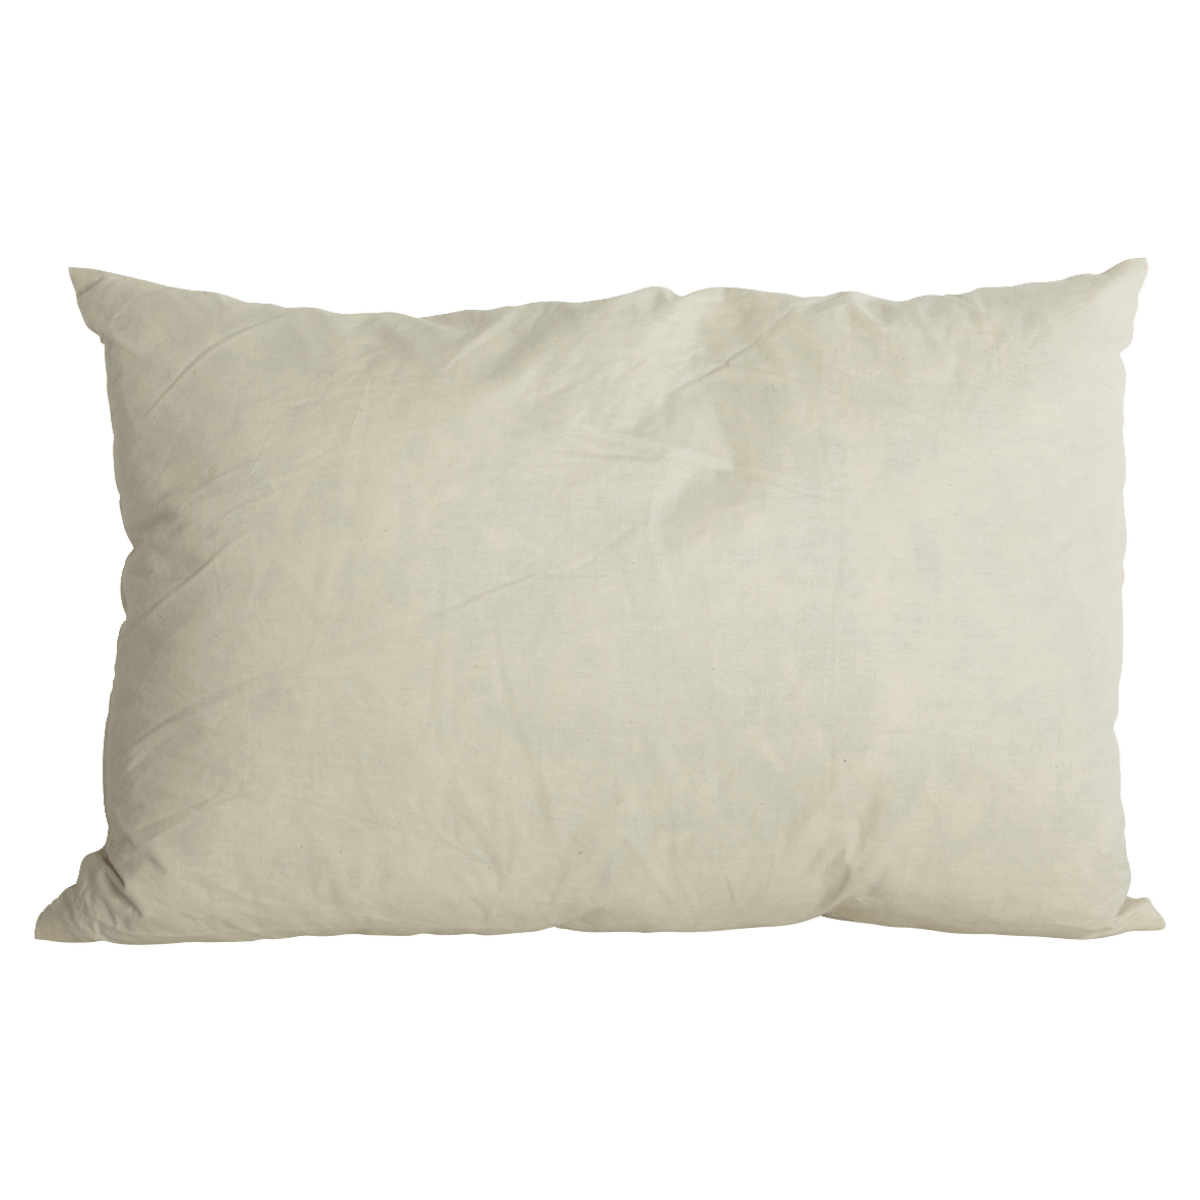 Bílý polštář 30x50 cm